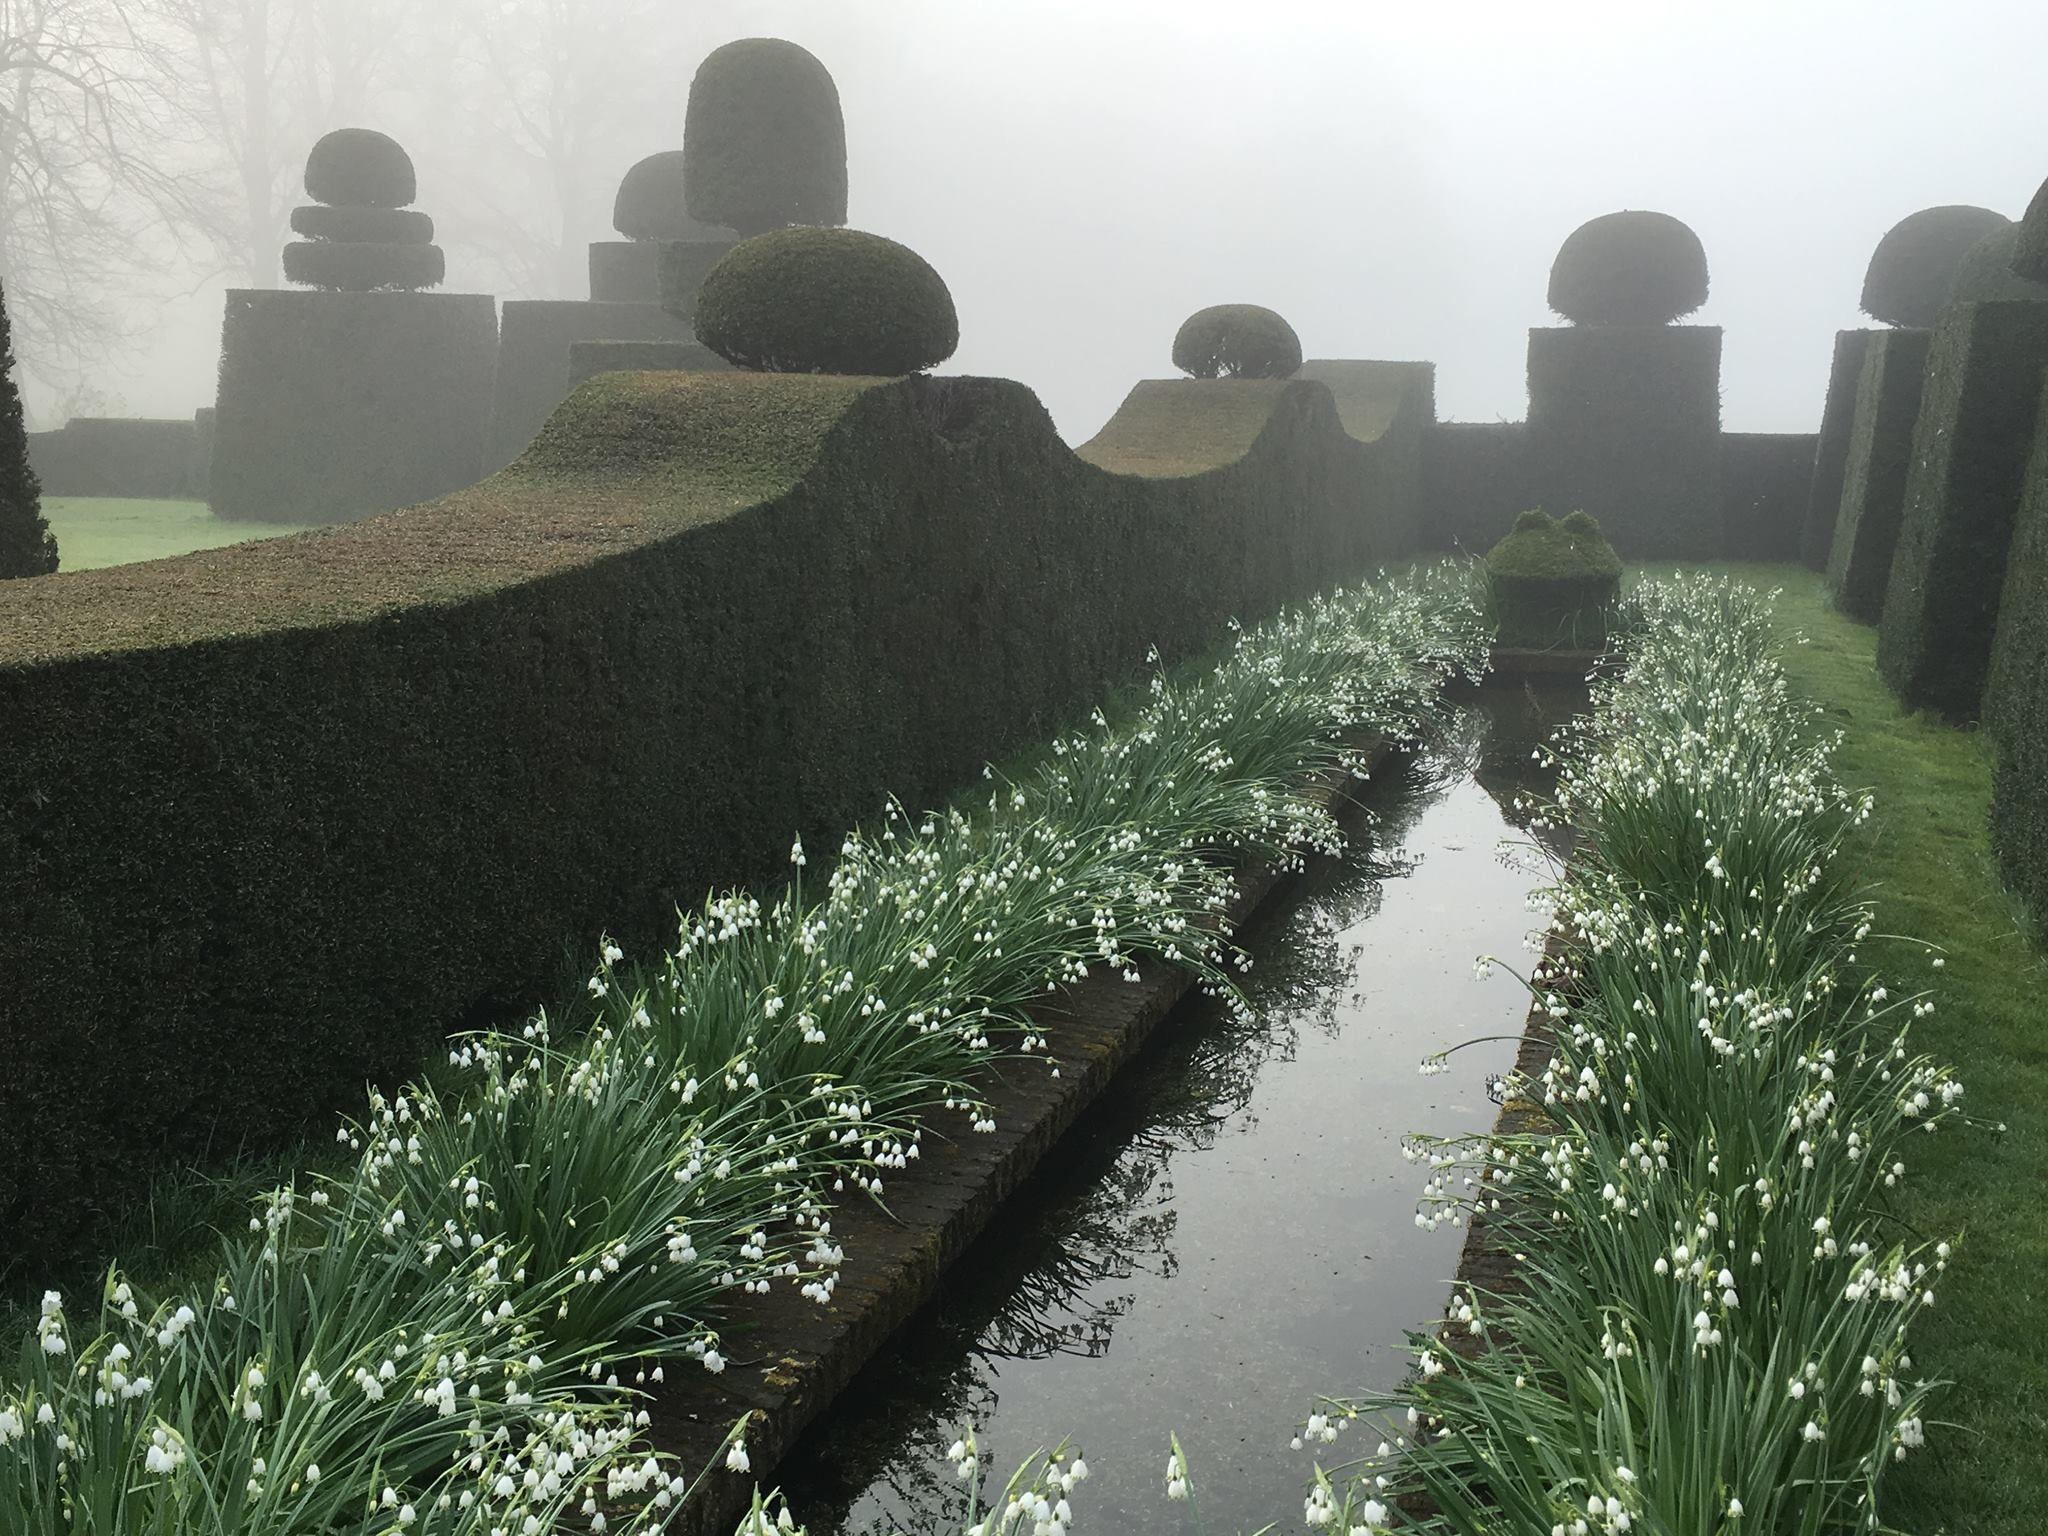 leucojum aestivum gravetye giant blooming at huis bingerden in the netherlands photography by - Garden Design By Carolyn Mullet